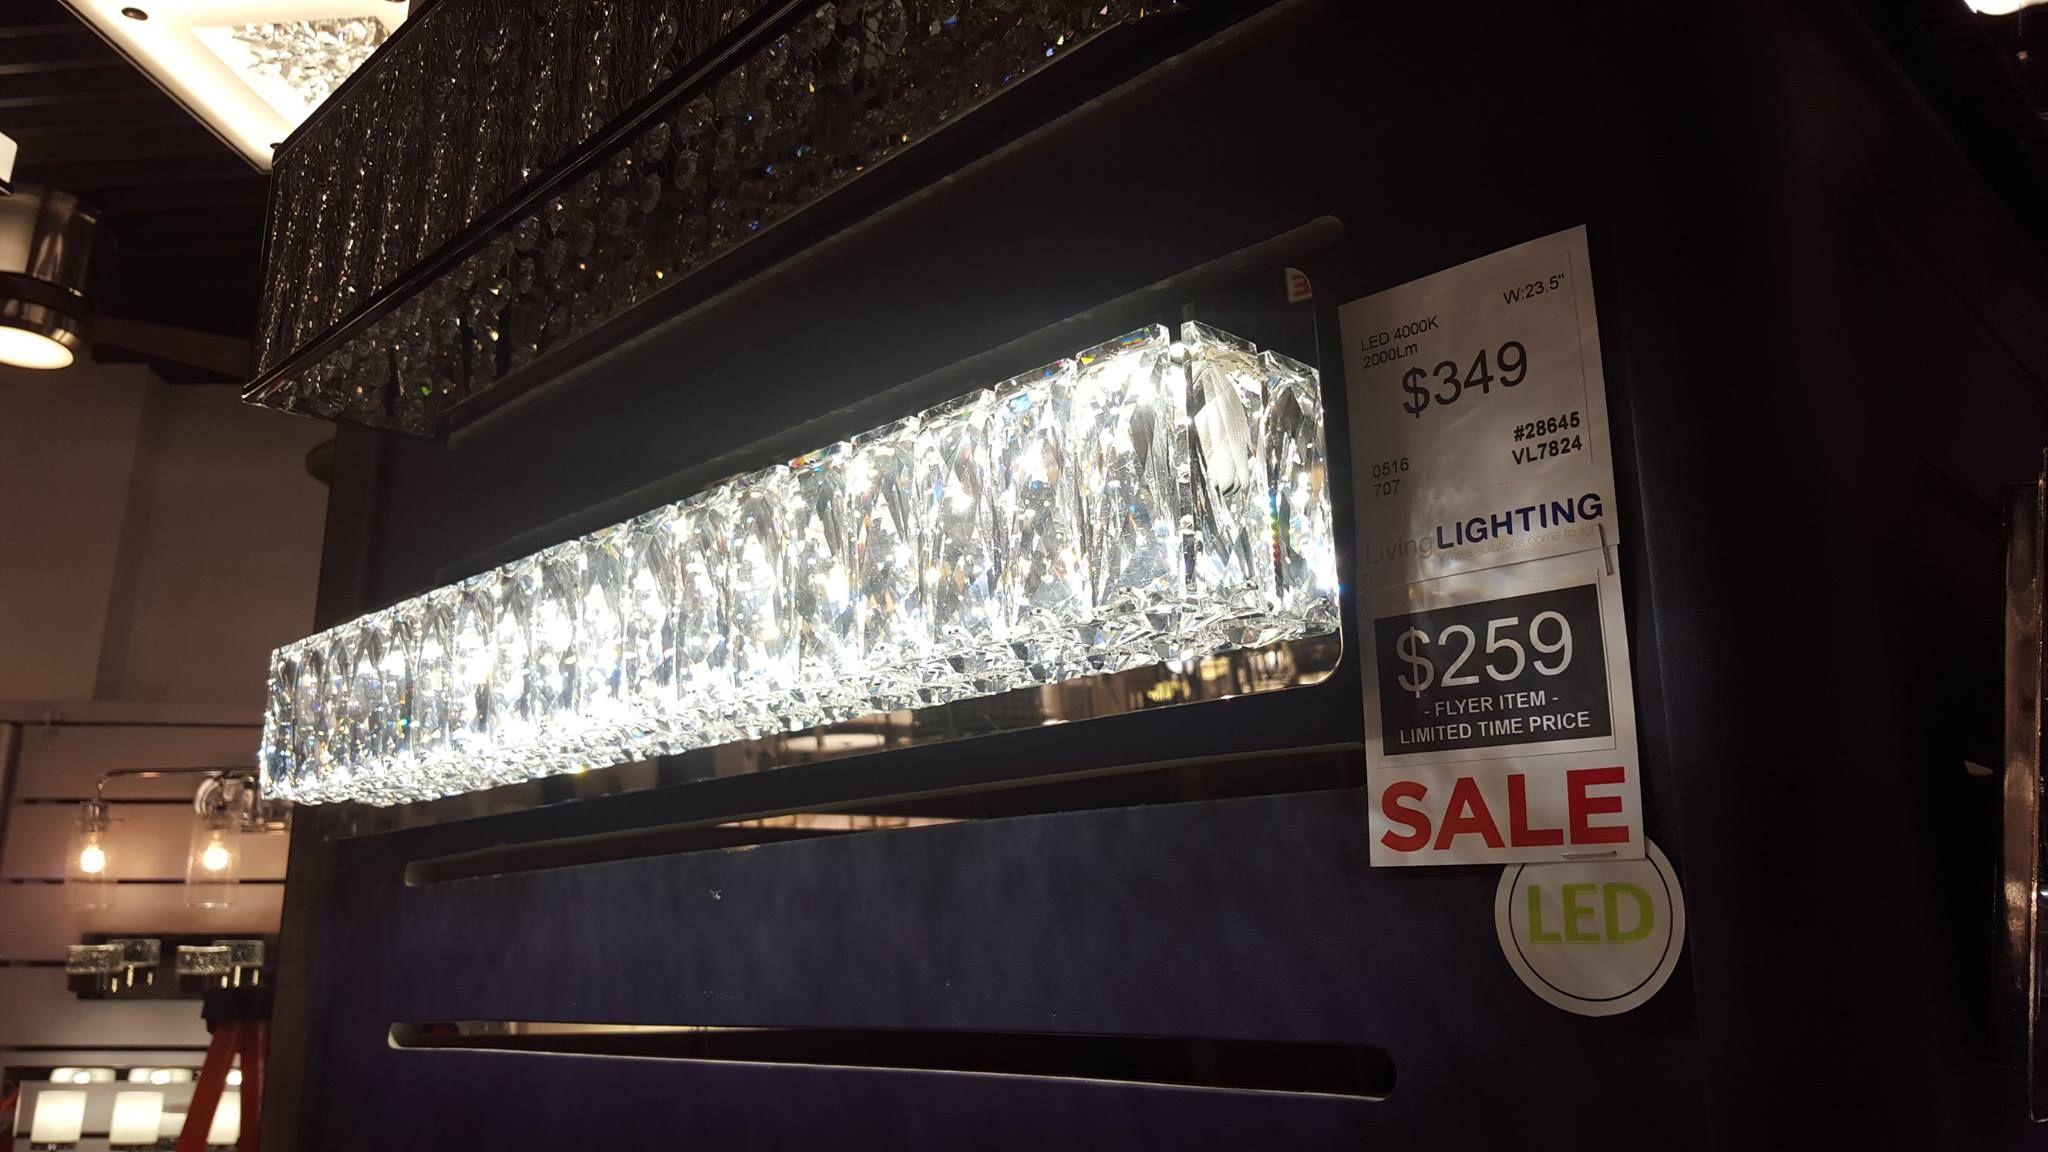 #LED #Crystal #bathroomlights #Kuzco